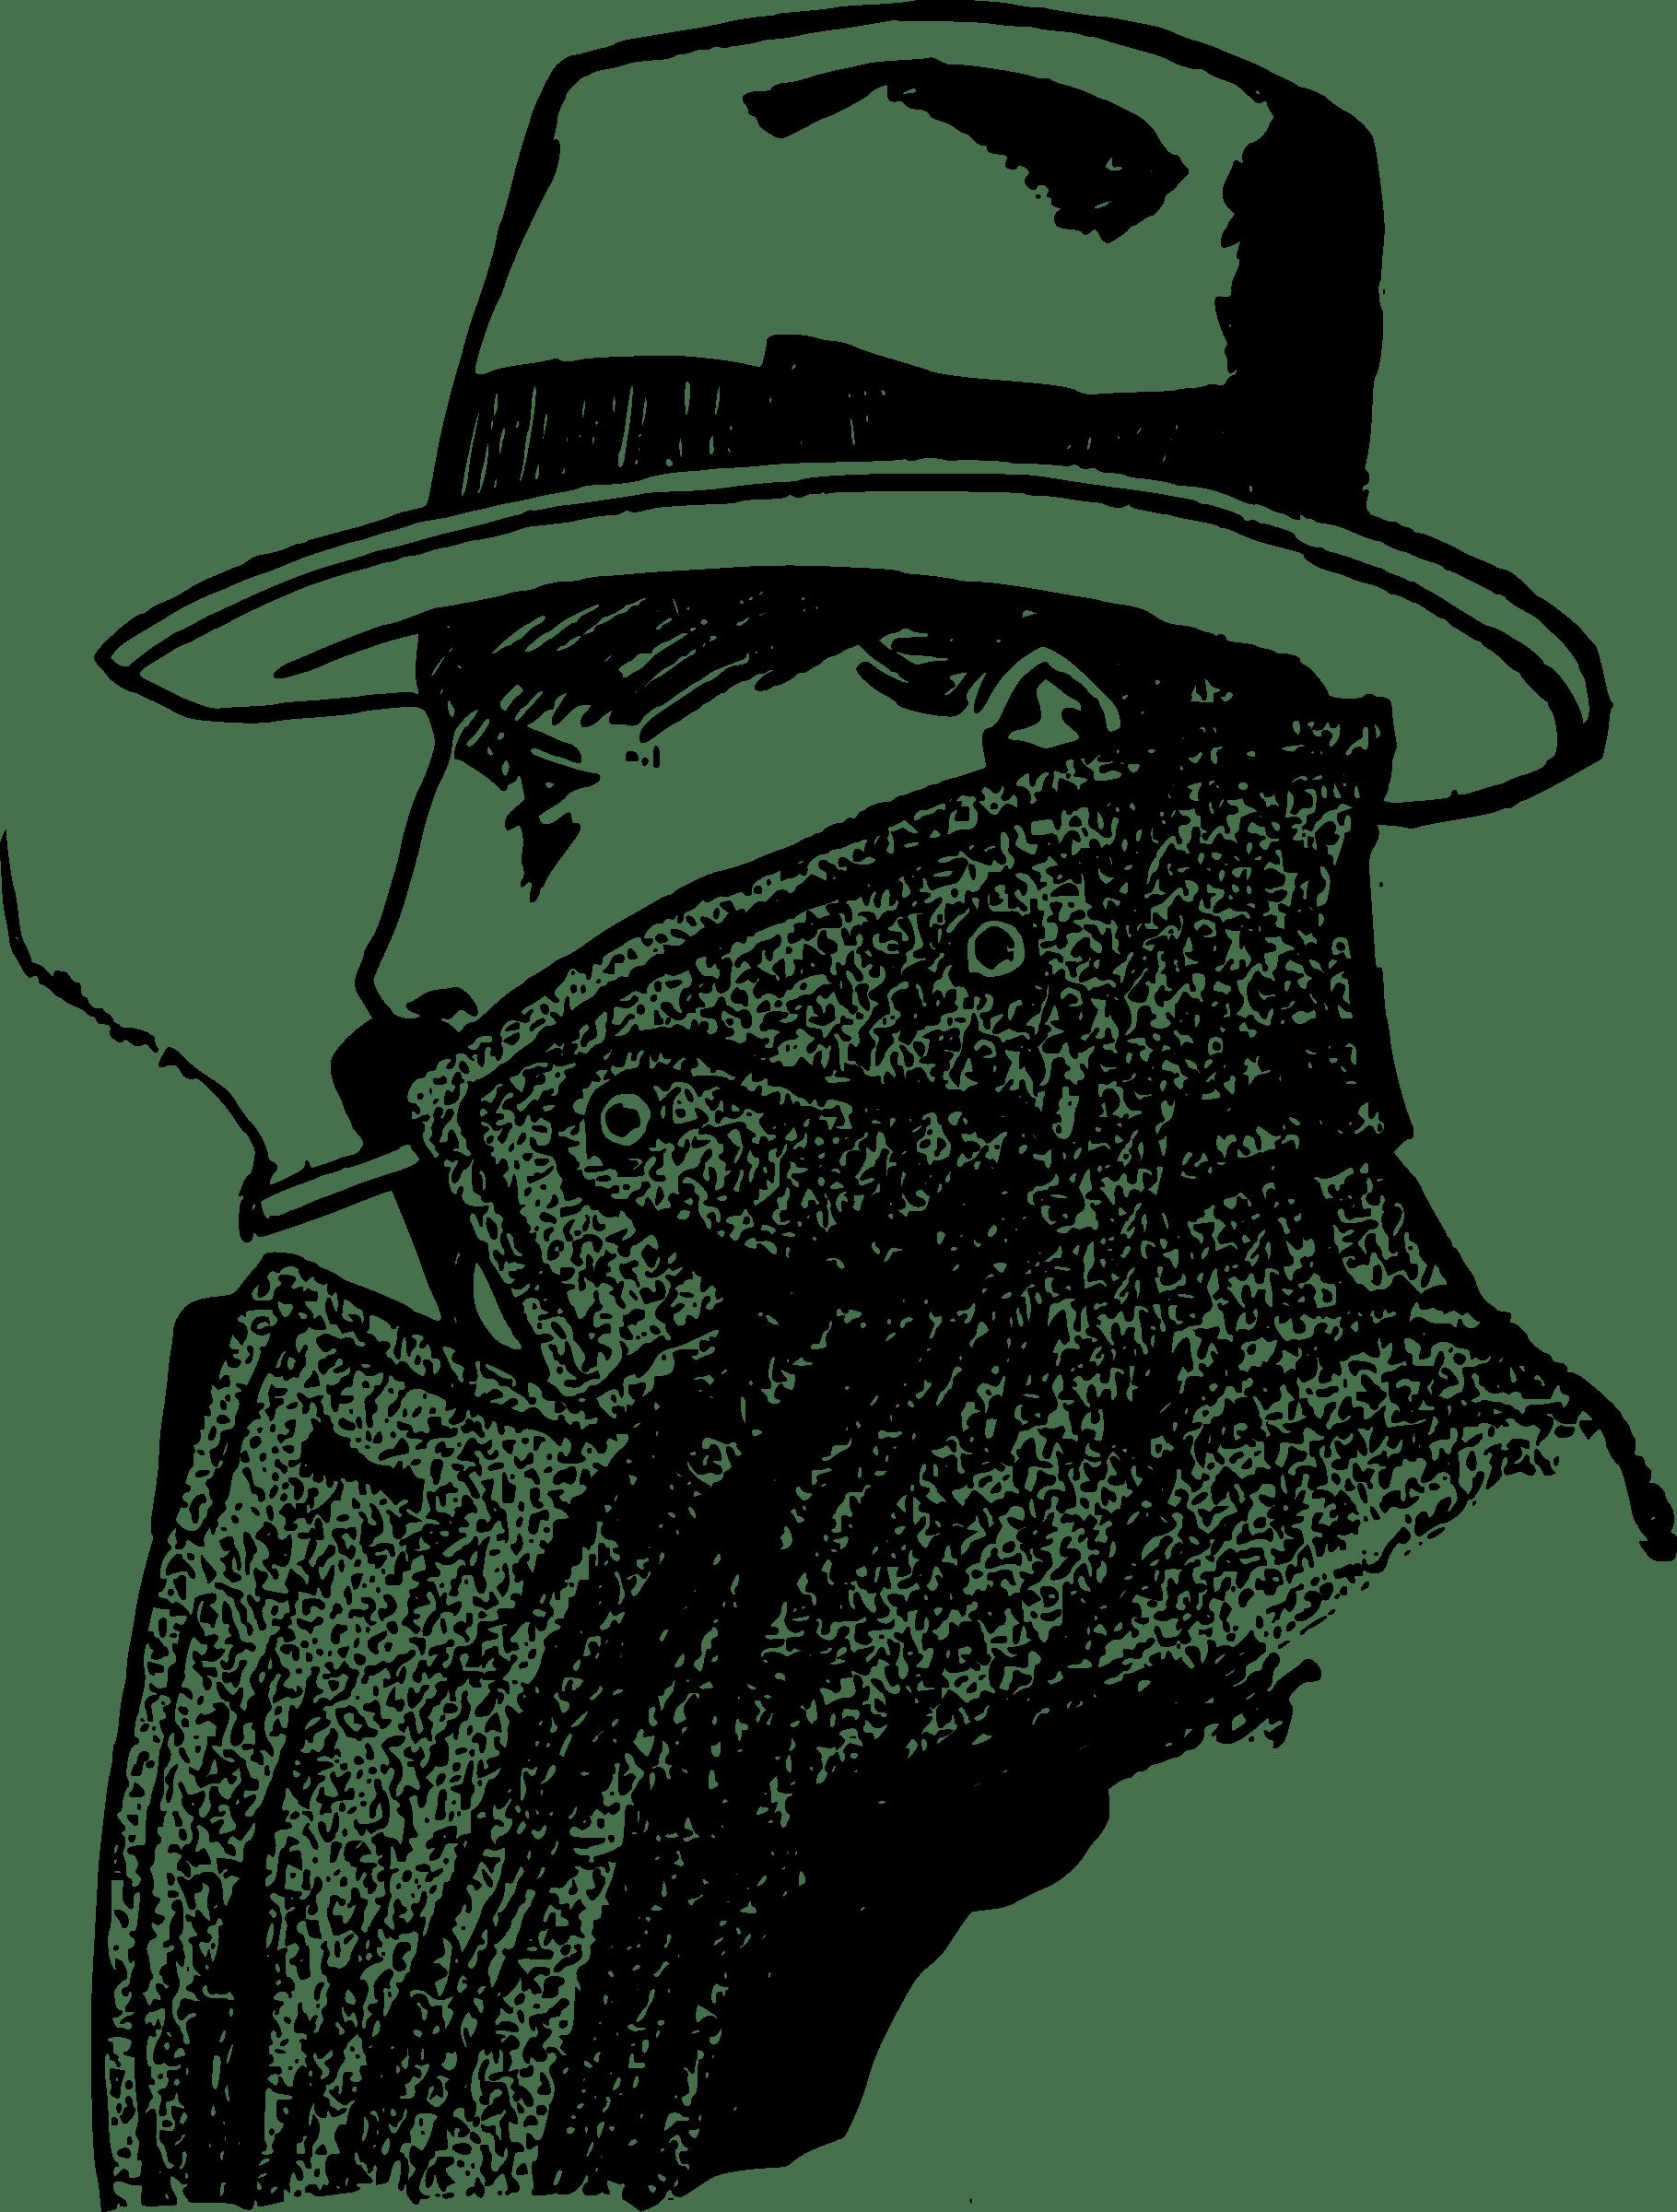 Spy cilpart extraordinary transparent. Detective clipart circumspect